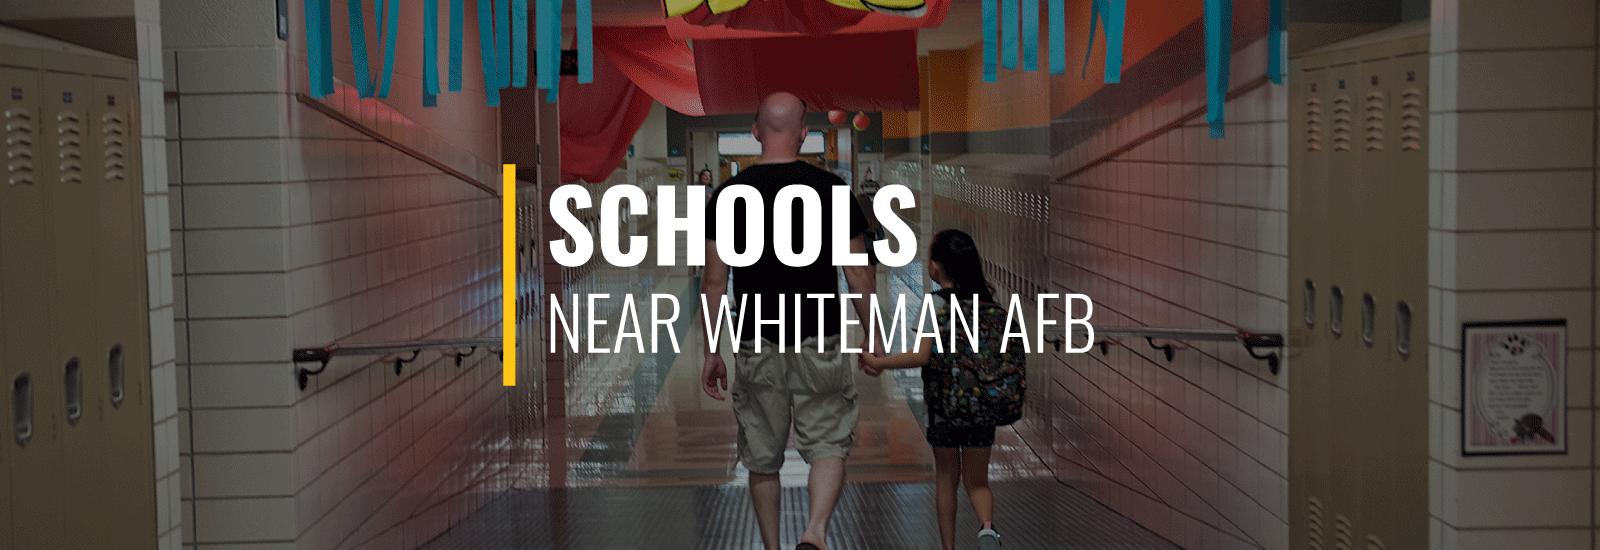 Whiteman AFB Schools